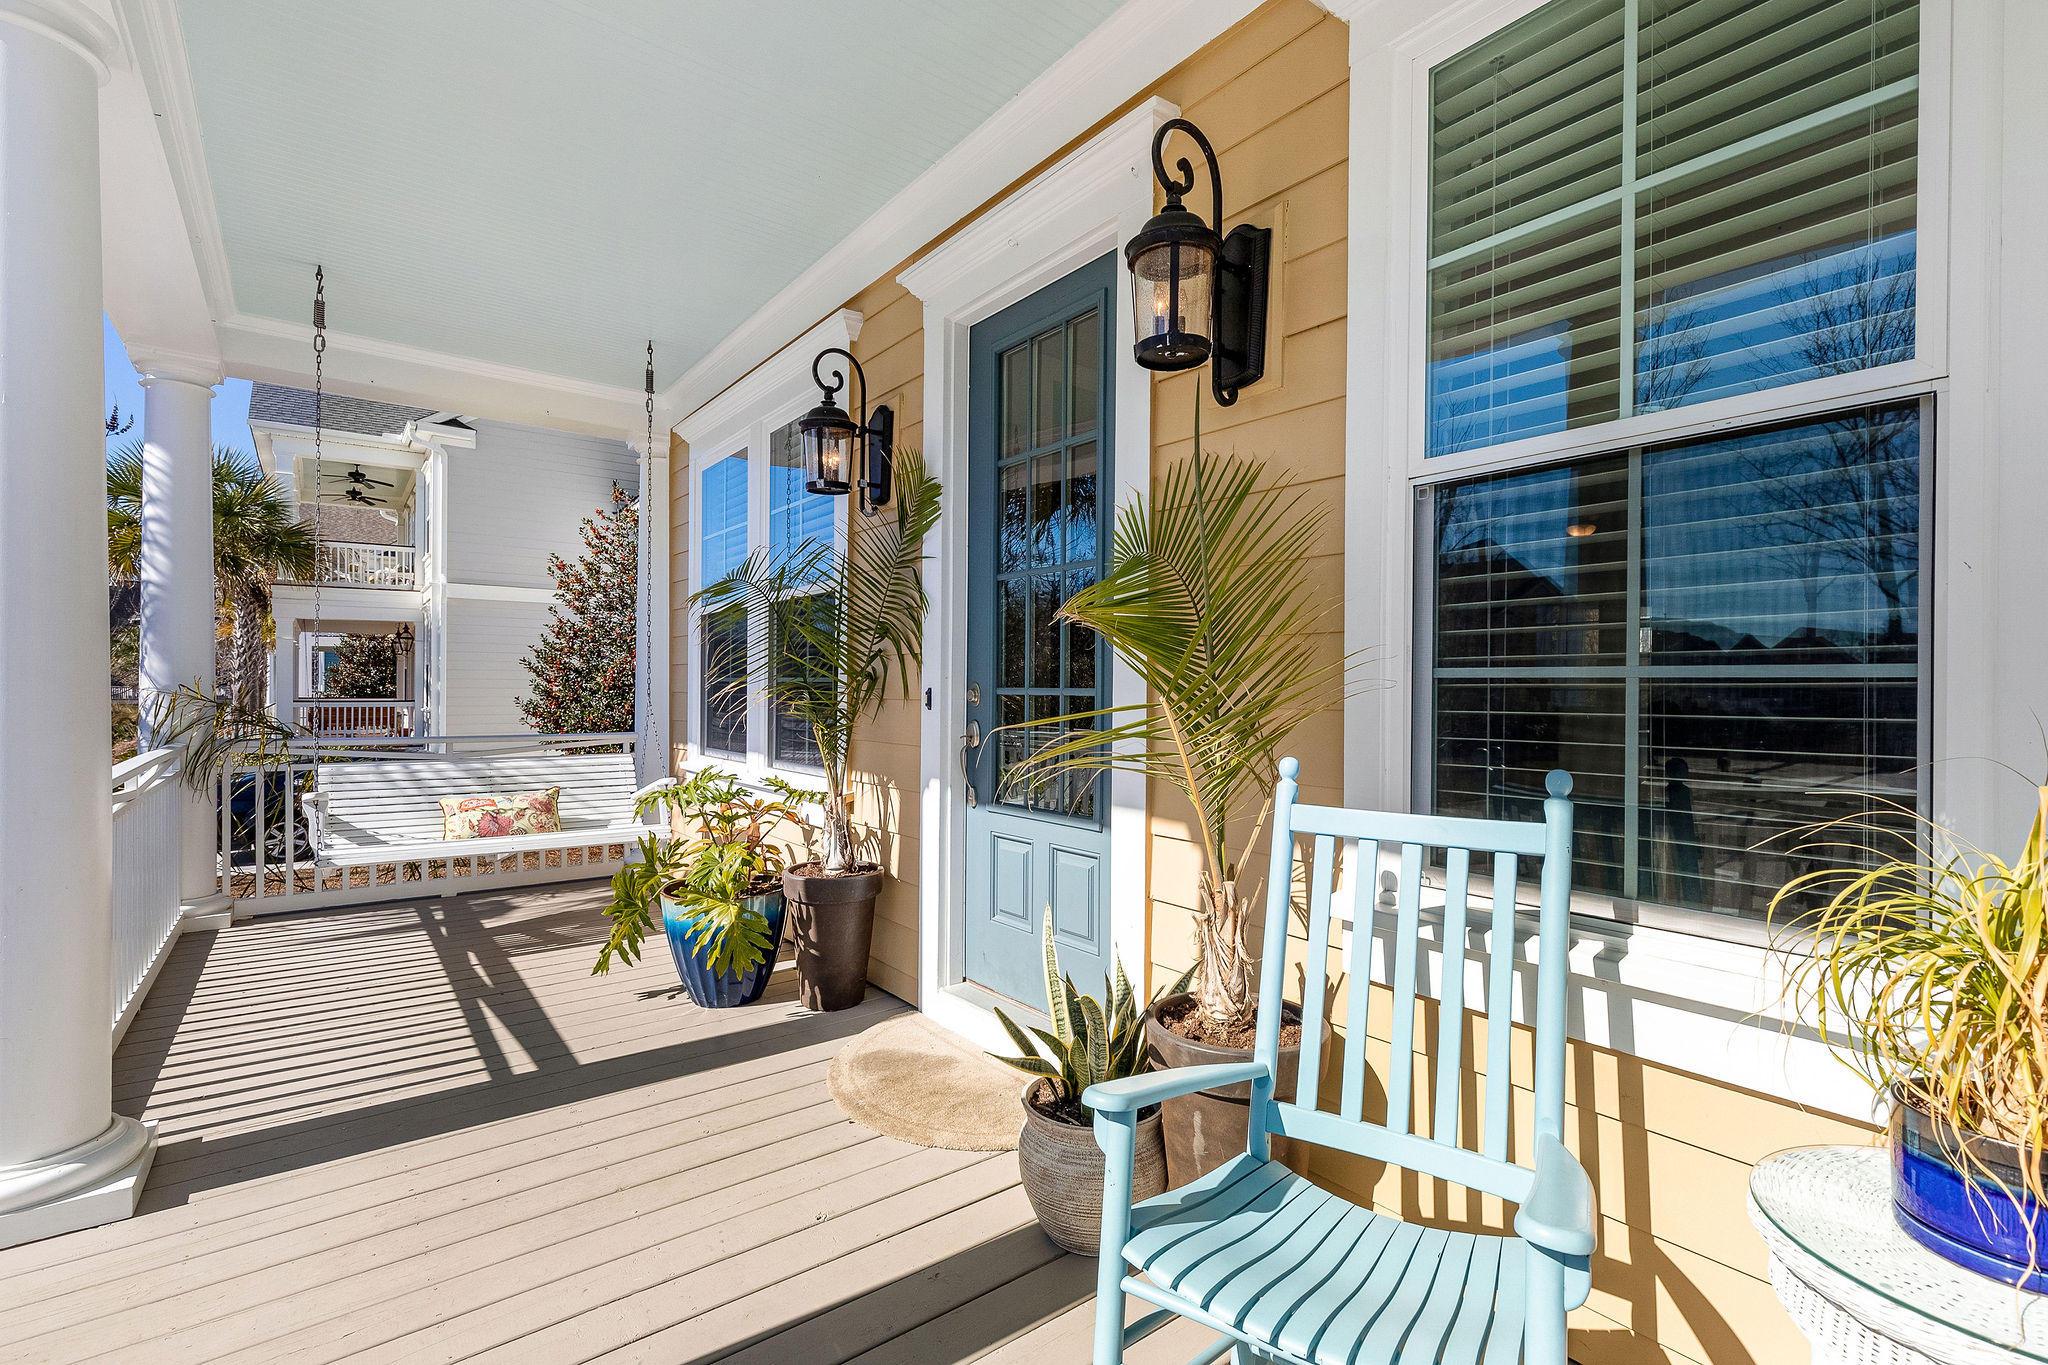 Dunes West Homes For Sale - 3212 Hatchway, Mount Pleasant, SC - 16